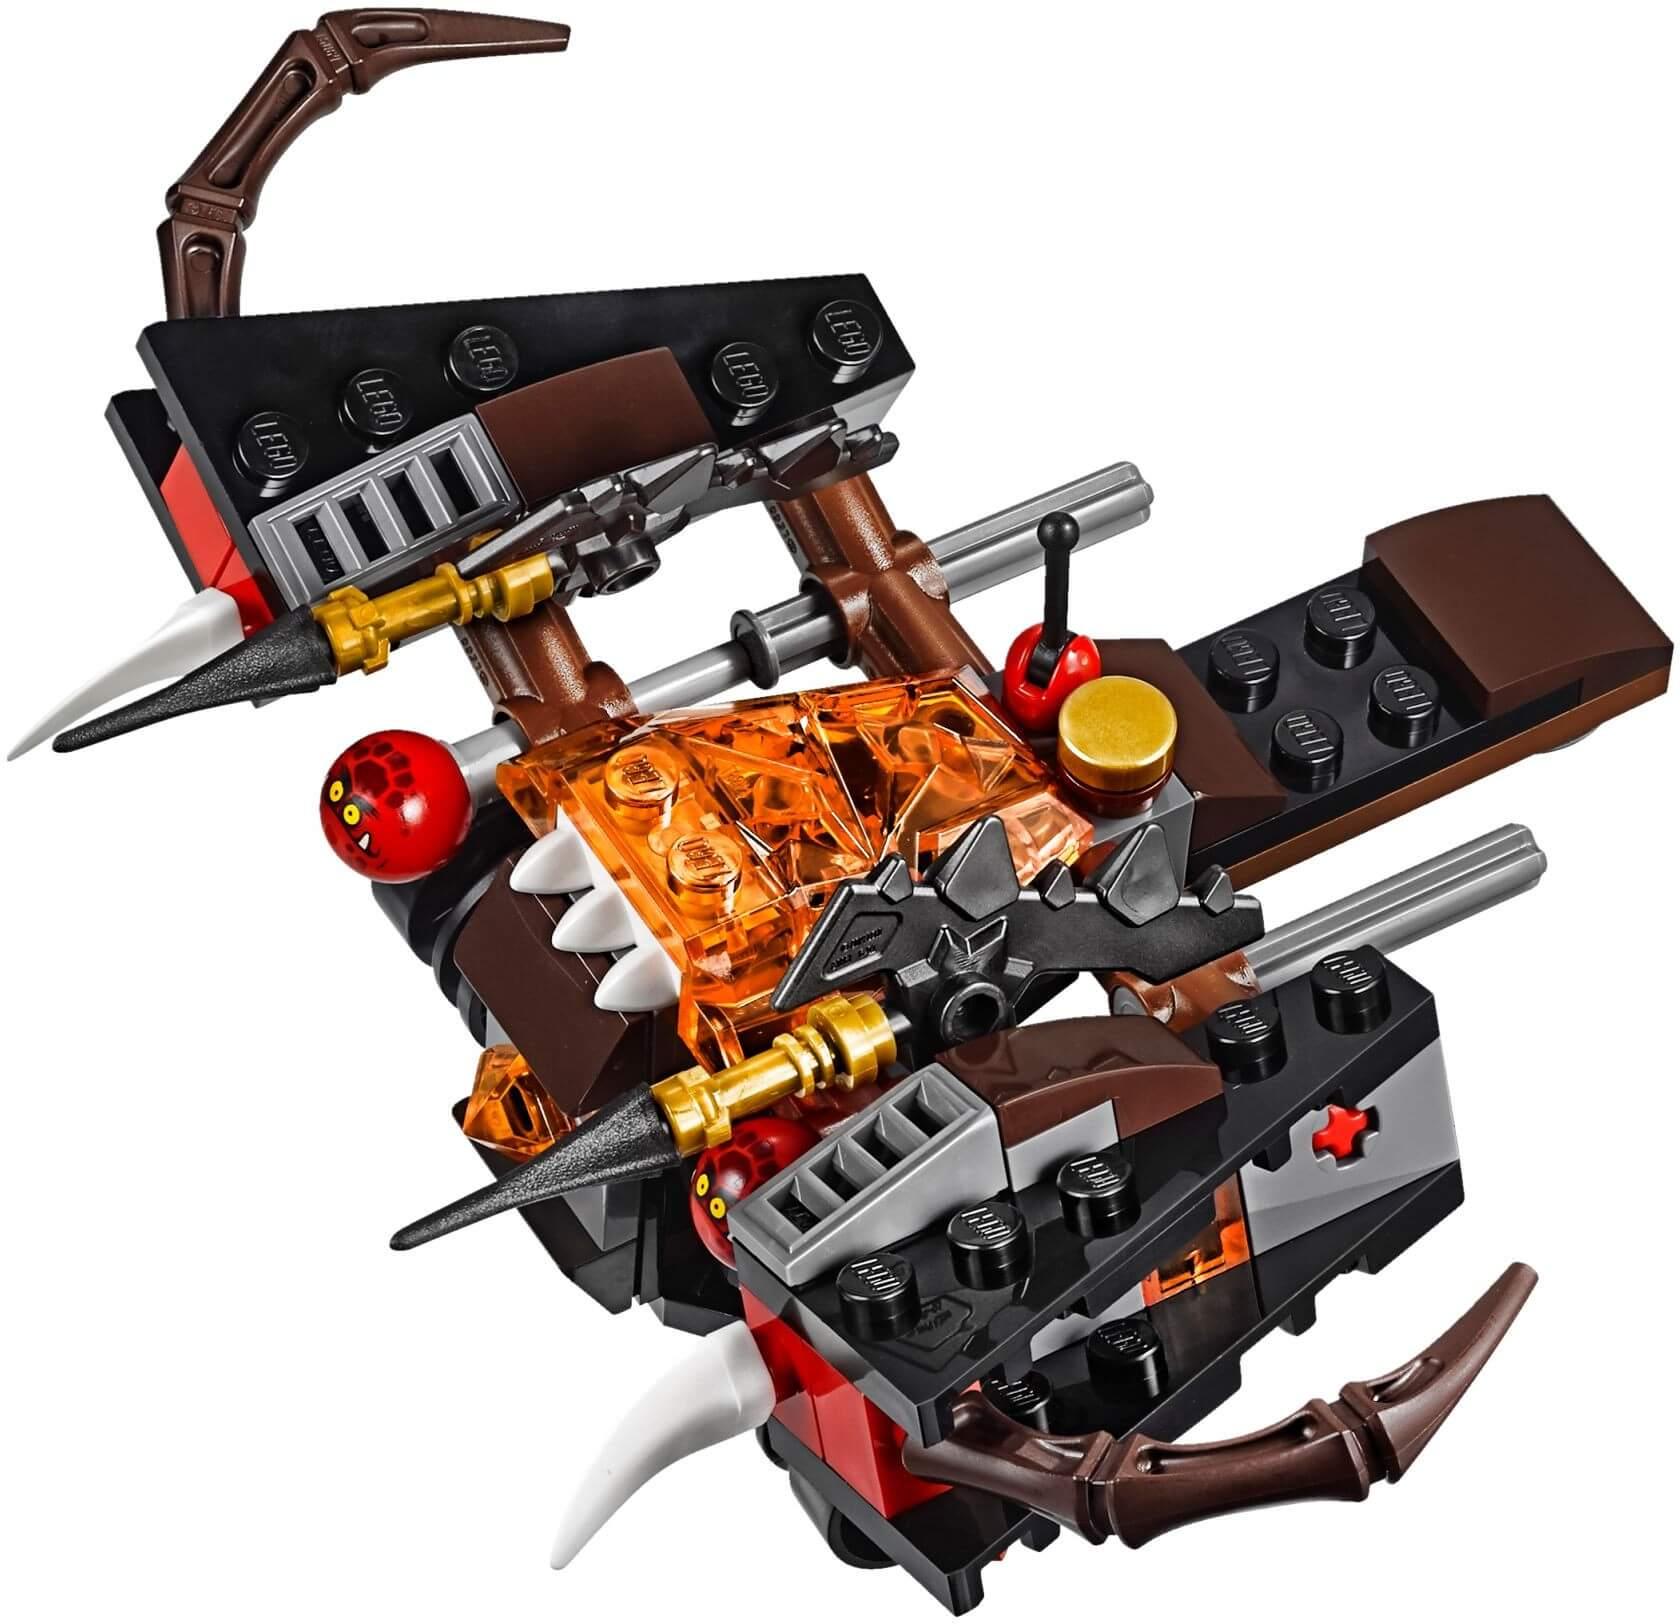 Mua đồ chơi LEGO 70318 - LEGO Nexo Knights 70318 - Máy Bắn Quái Vật Glob (LEGO Nexo Knights The Glob Lobber 70318)